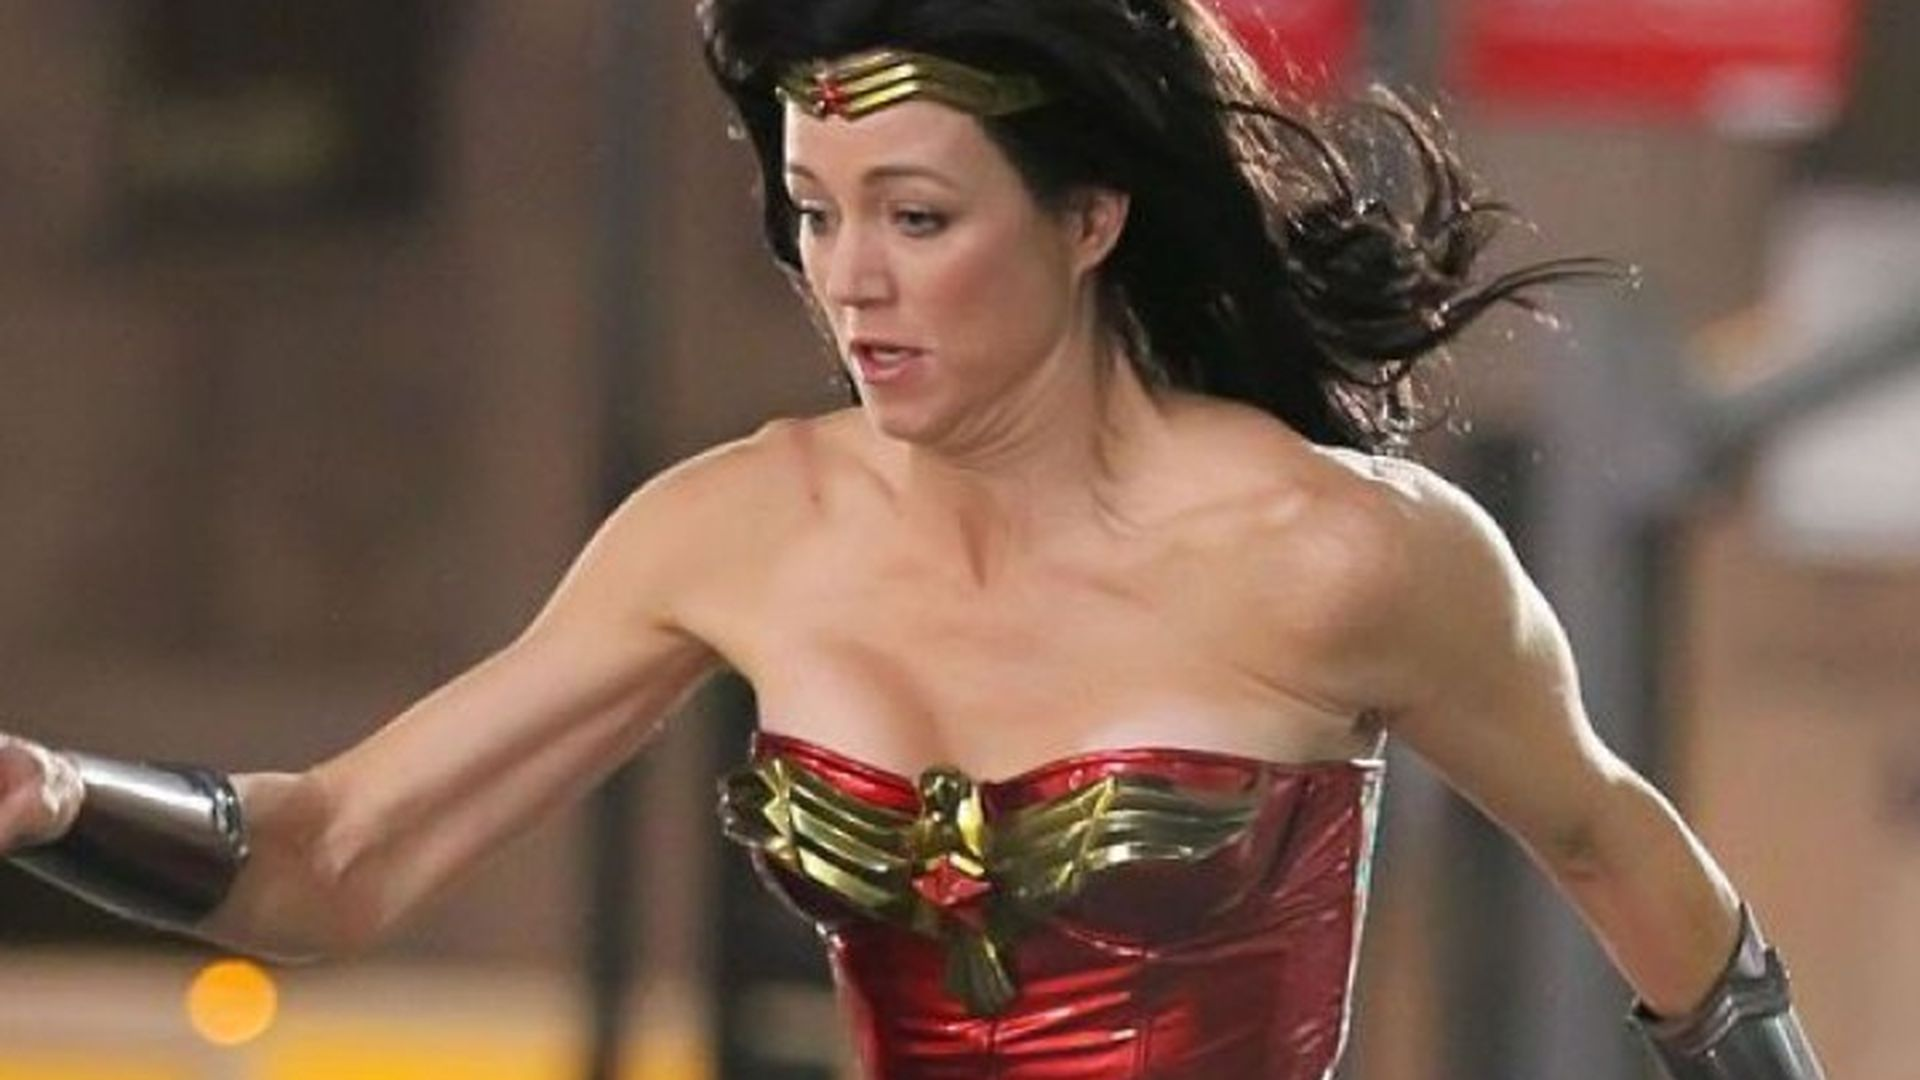 hot naked superhero women